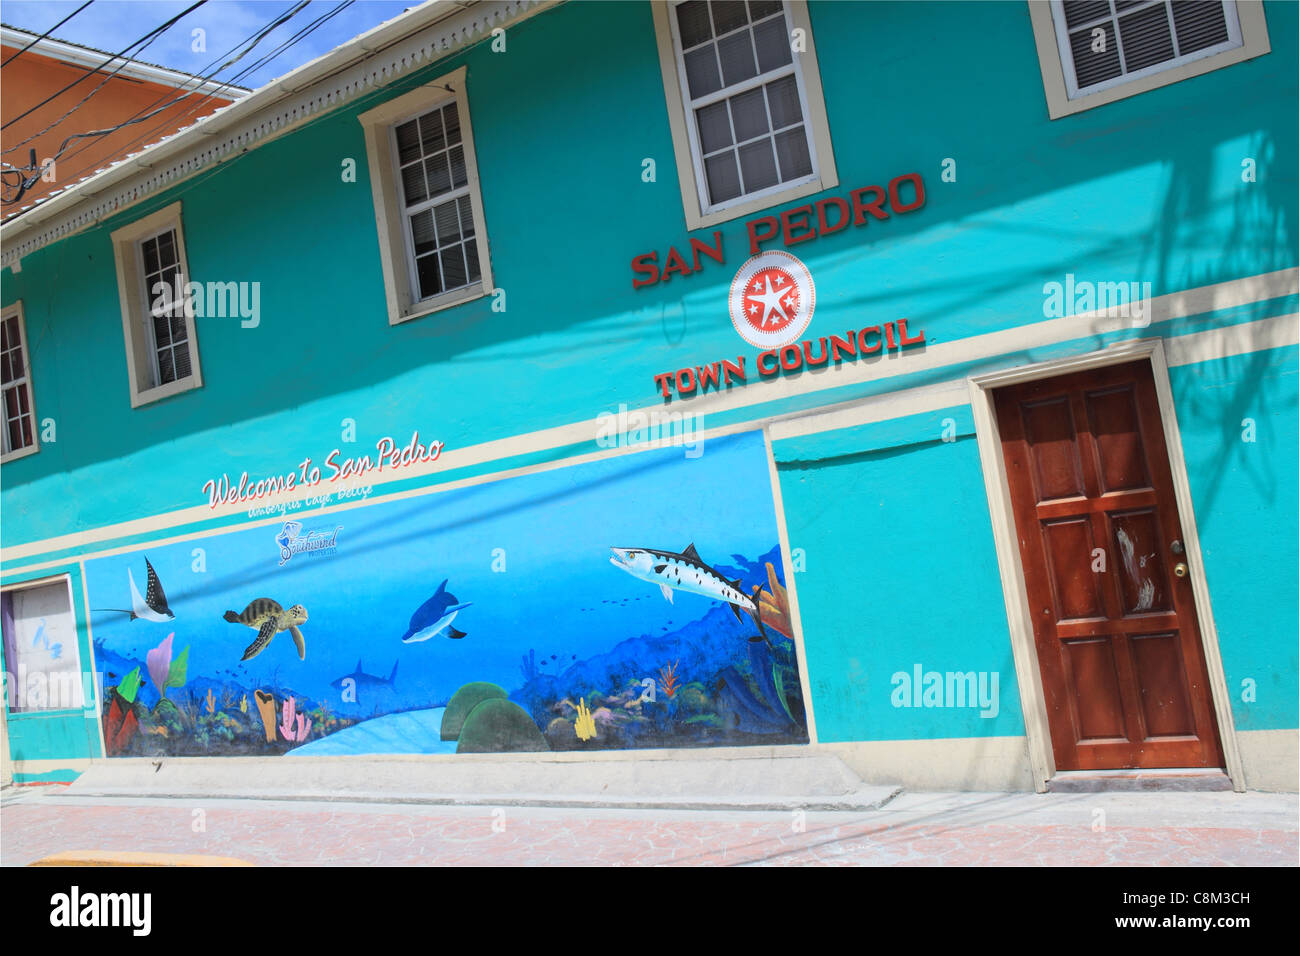 San Pedro Town Council building, Barrier Reef Drive, Ambergris Caye (aka La Isla Bonita), Barrier Reef, Belize, - Stock Image